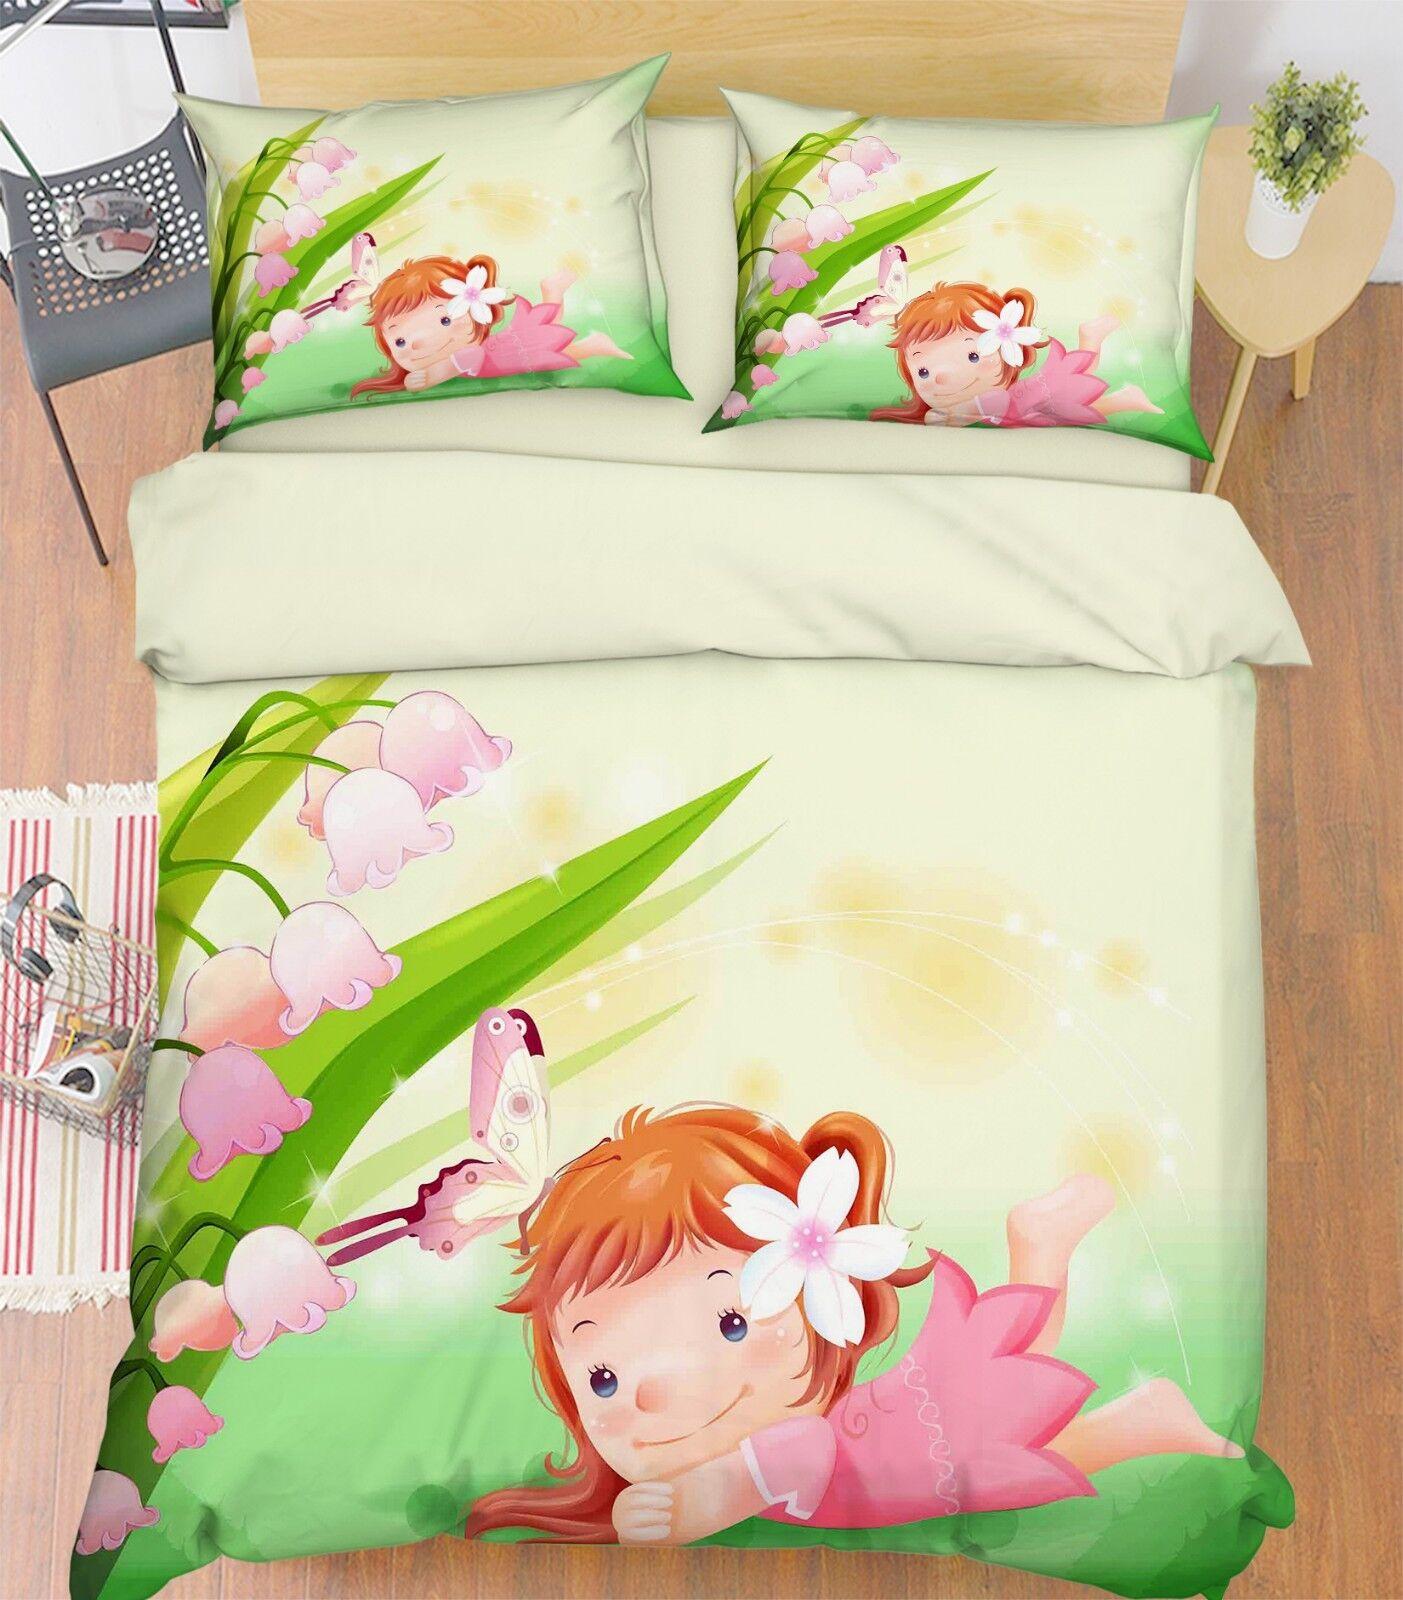 3D Cartoon Girl 677 Bed Pillowcases Quilt Duvet Cover Set Single Queen AU Carly